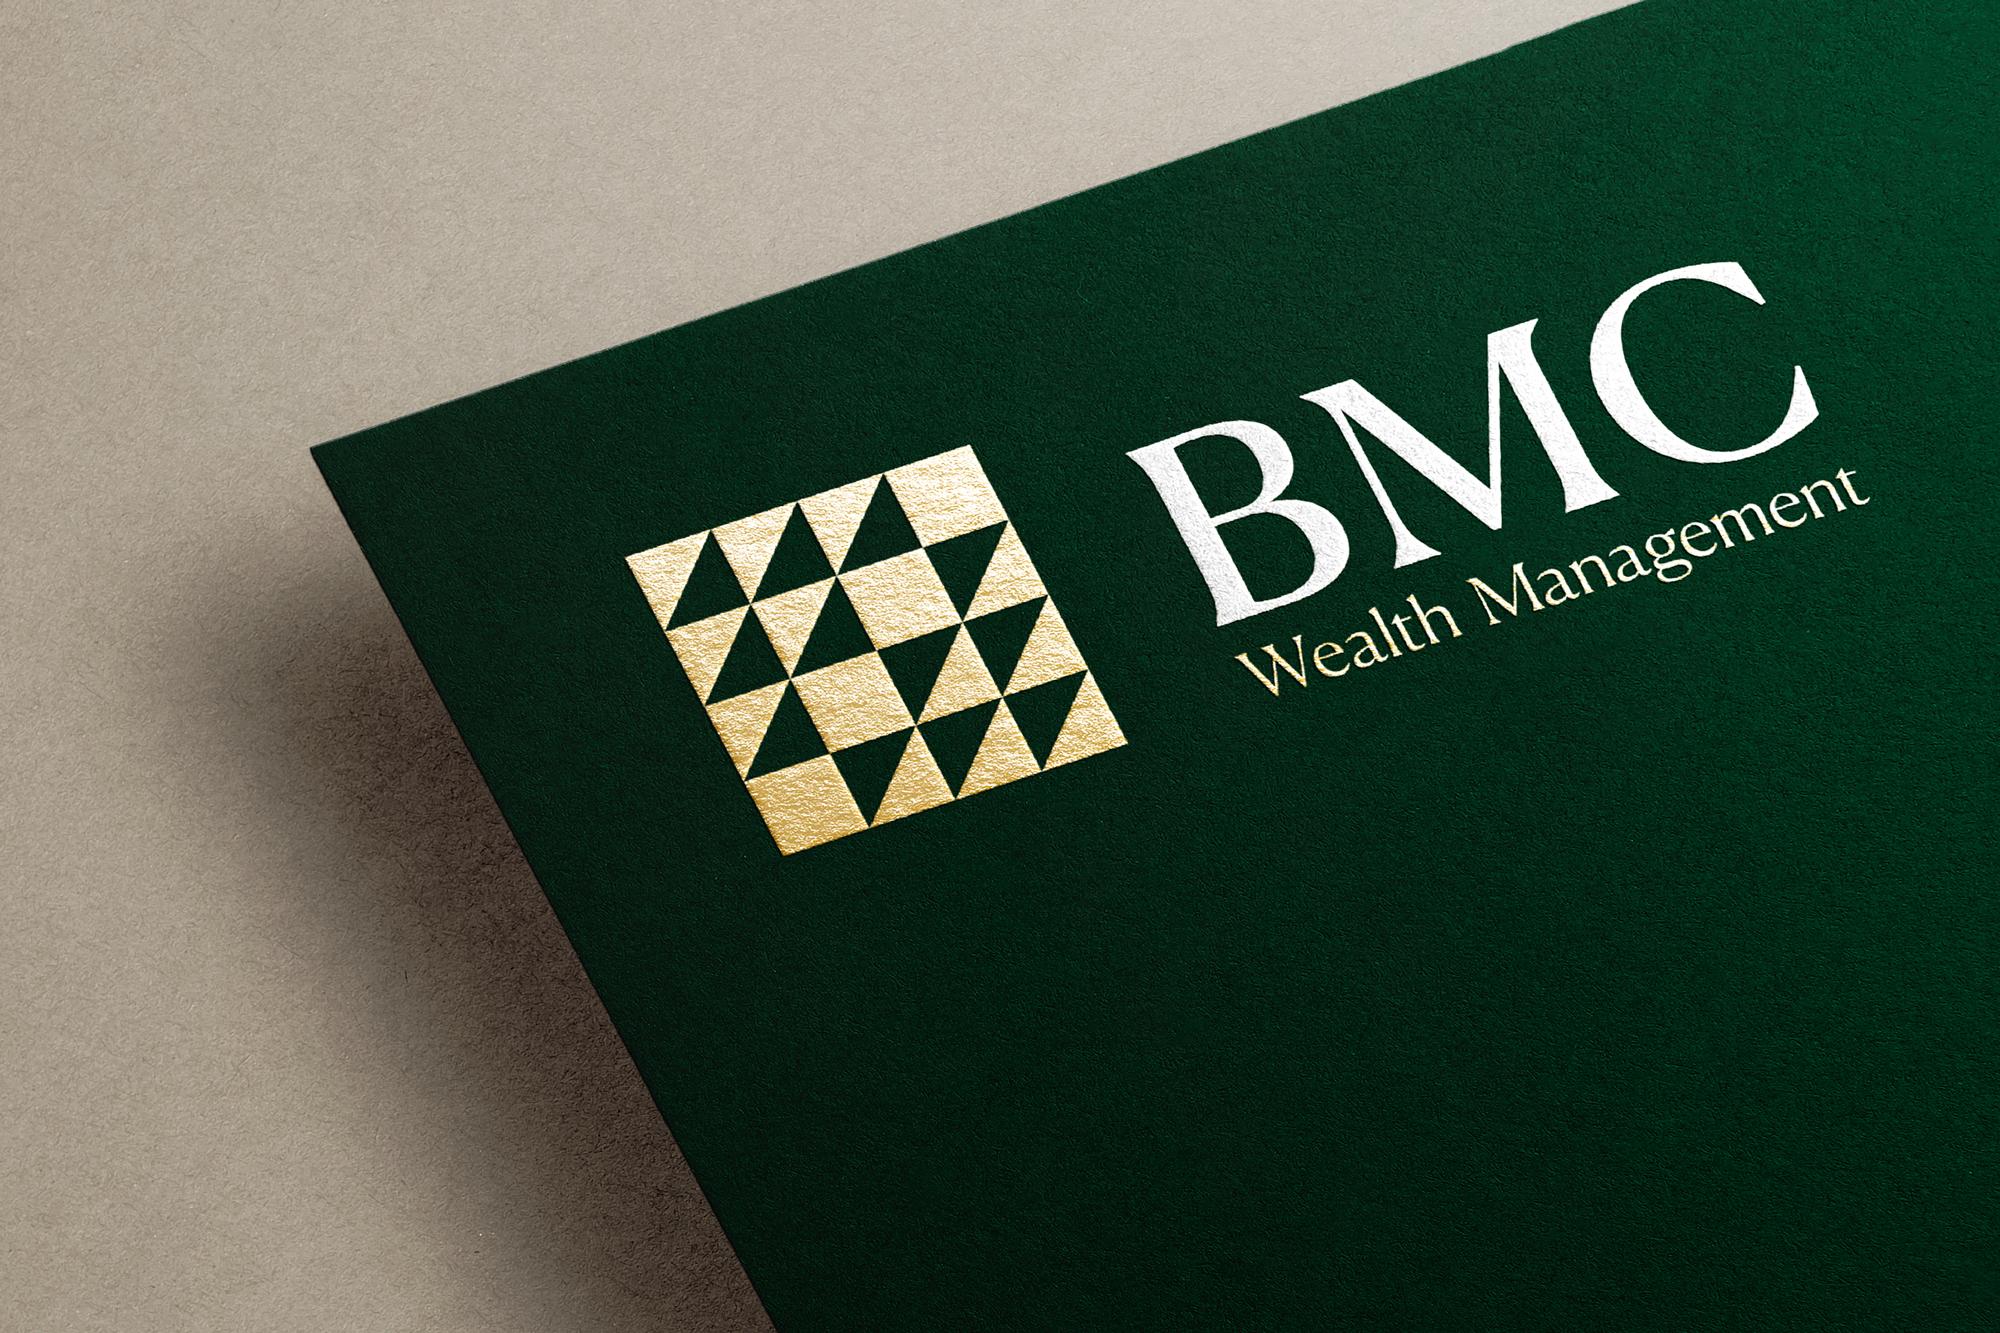 BMC Wealth Management logo foil printed onto green paper